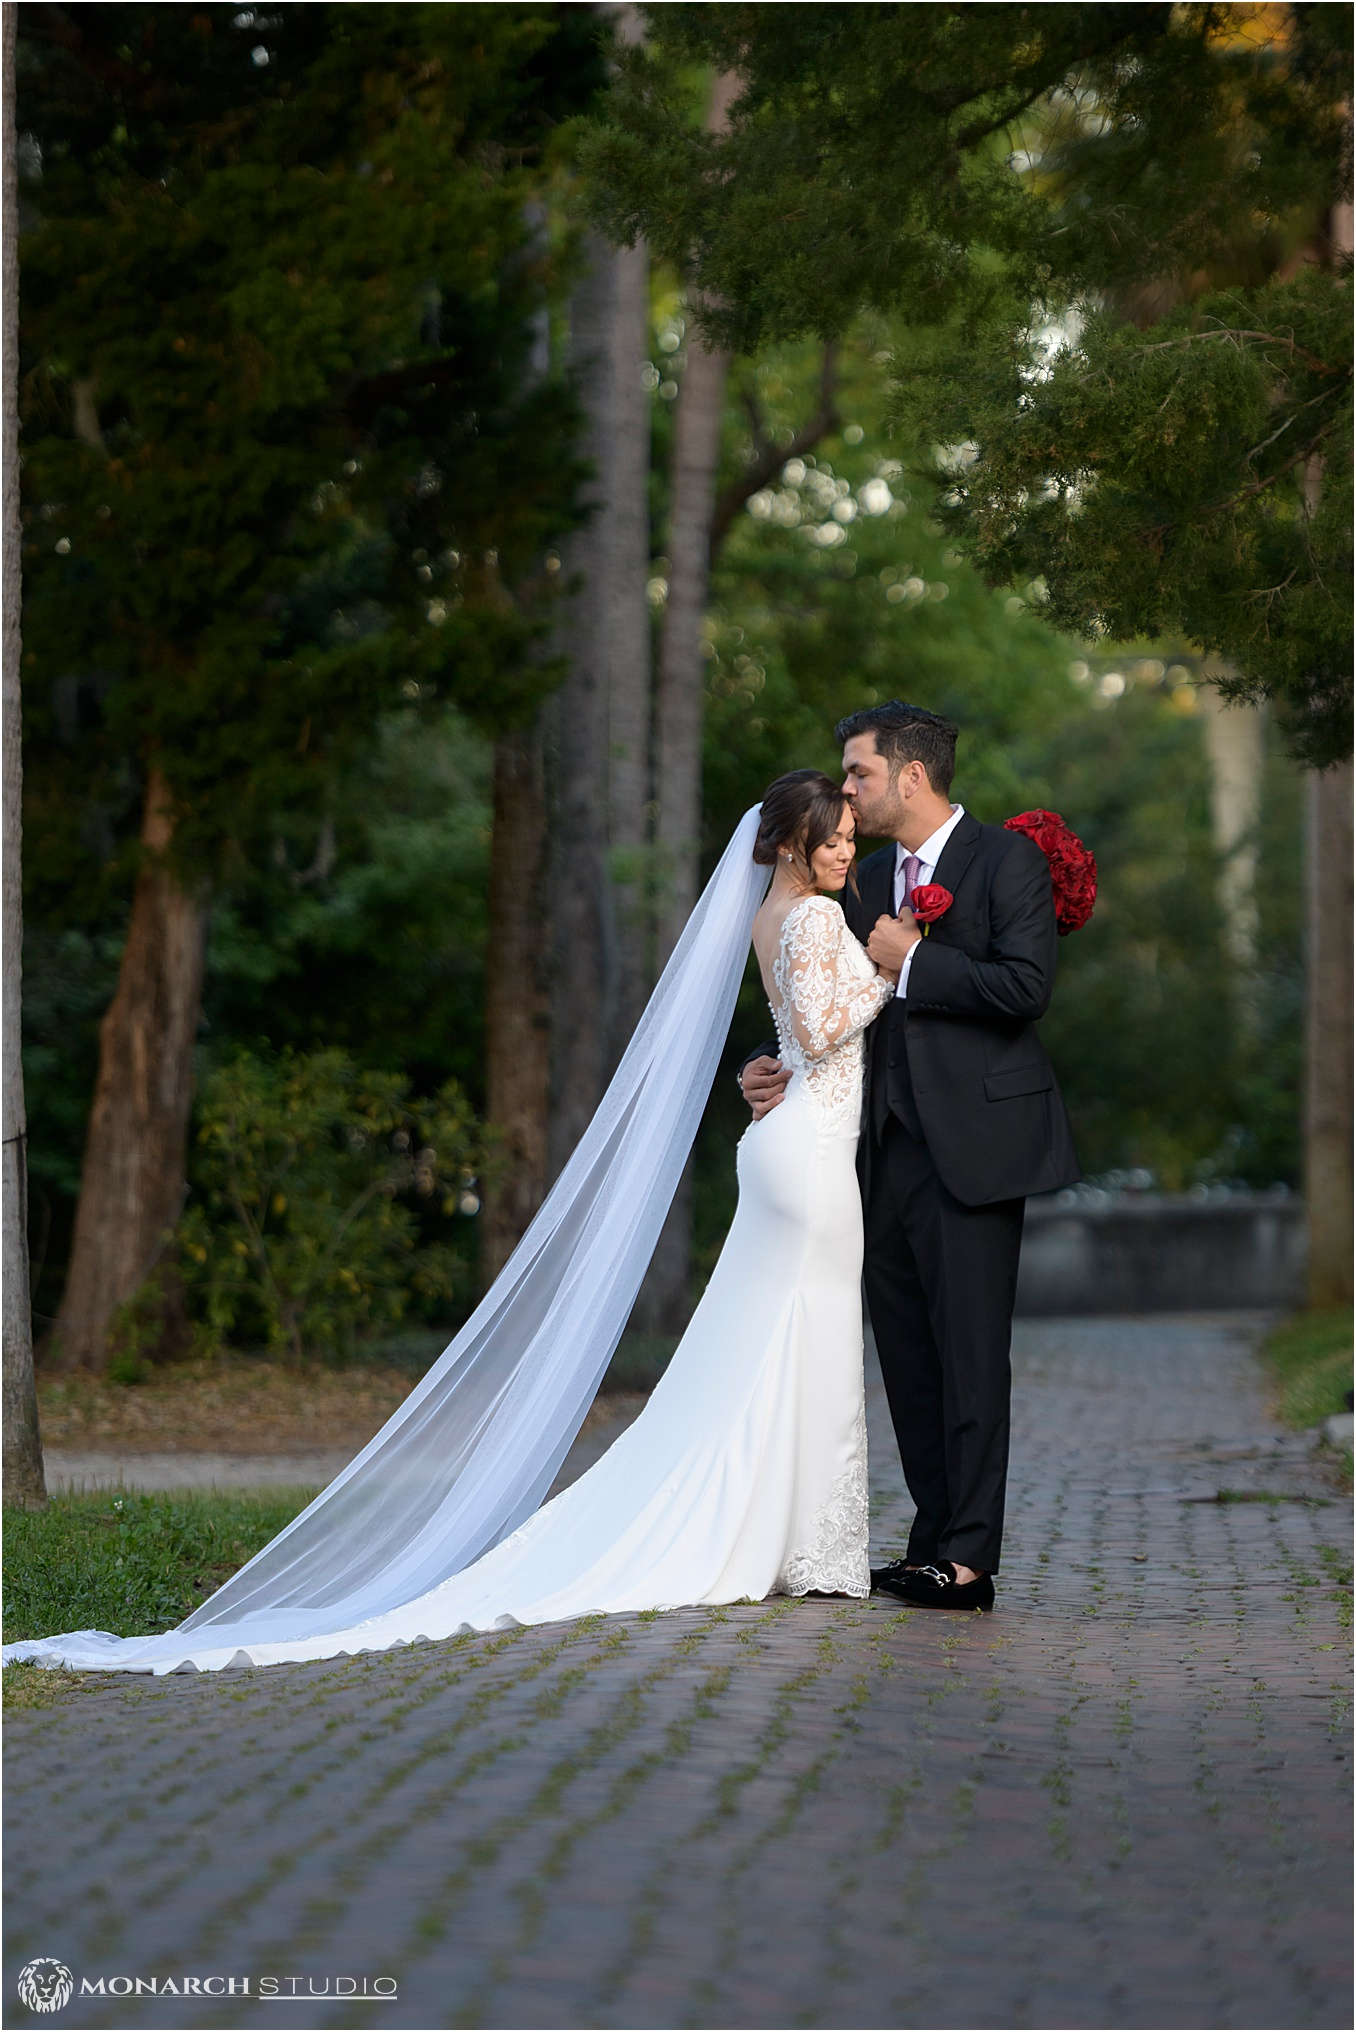 st-augustine-high-end-wedding-photographers-096.jpg